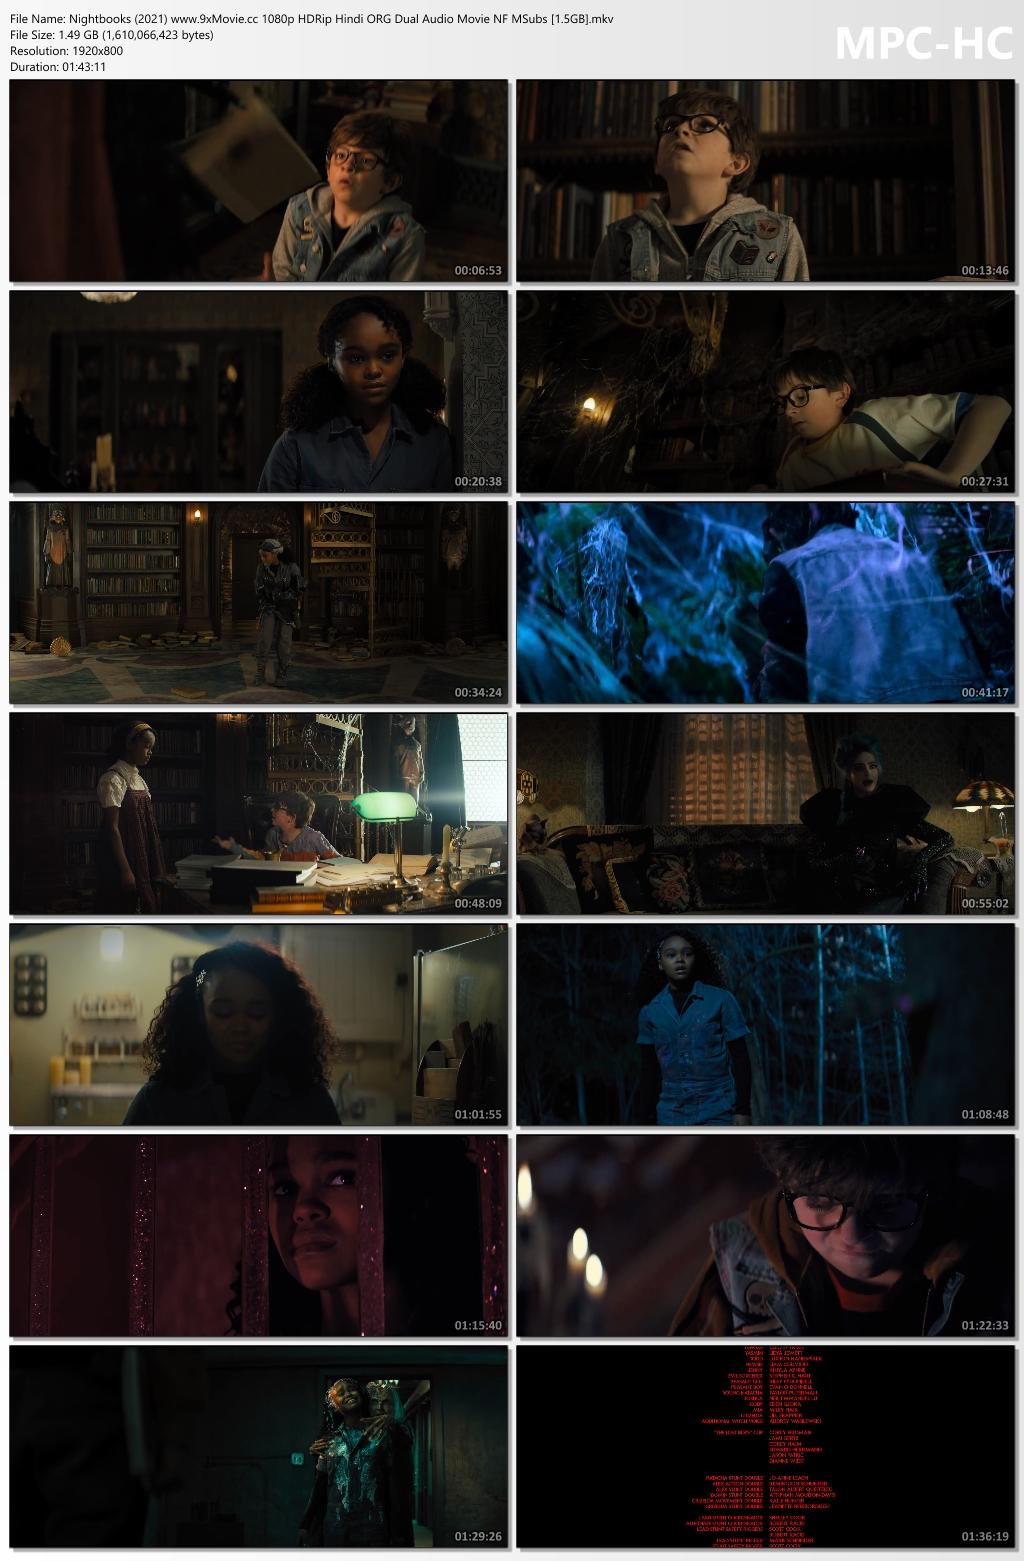 Nightbooks-2021-www-9x-Movie-cc-1080p-HDRip-Hindi-ORG-Dual-Audio-Movie-NF-MSubs-1-5-GB-mkv